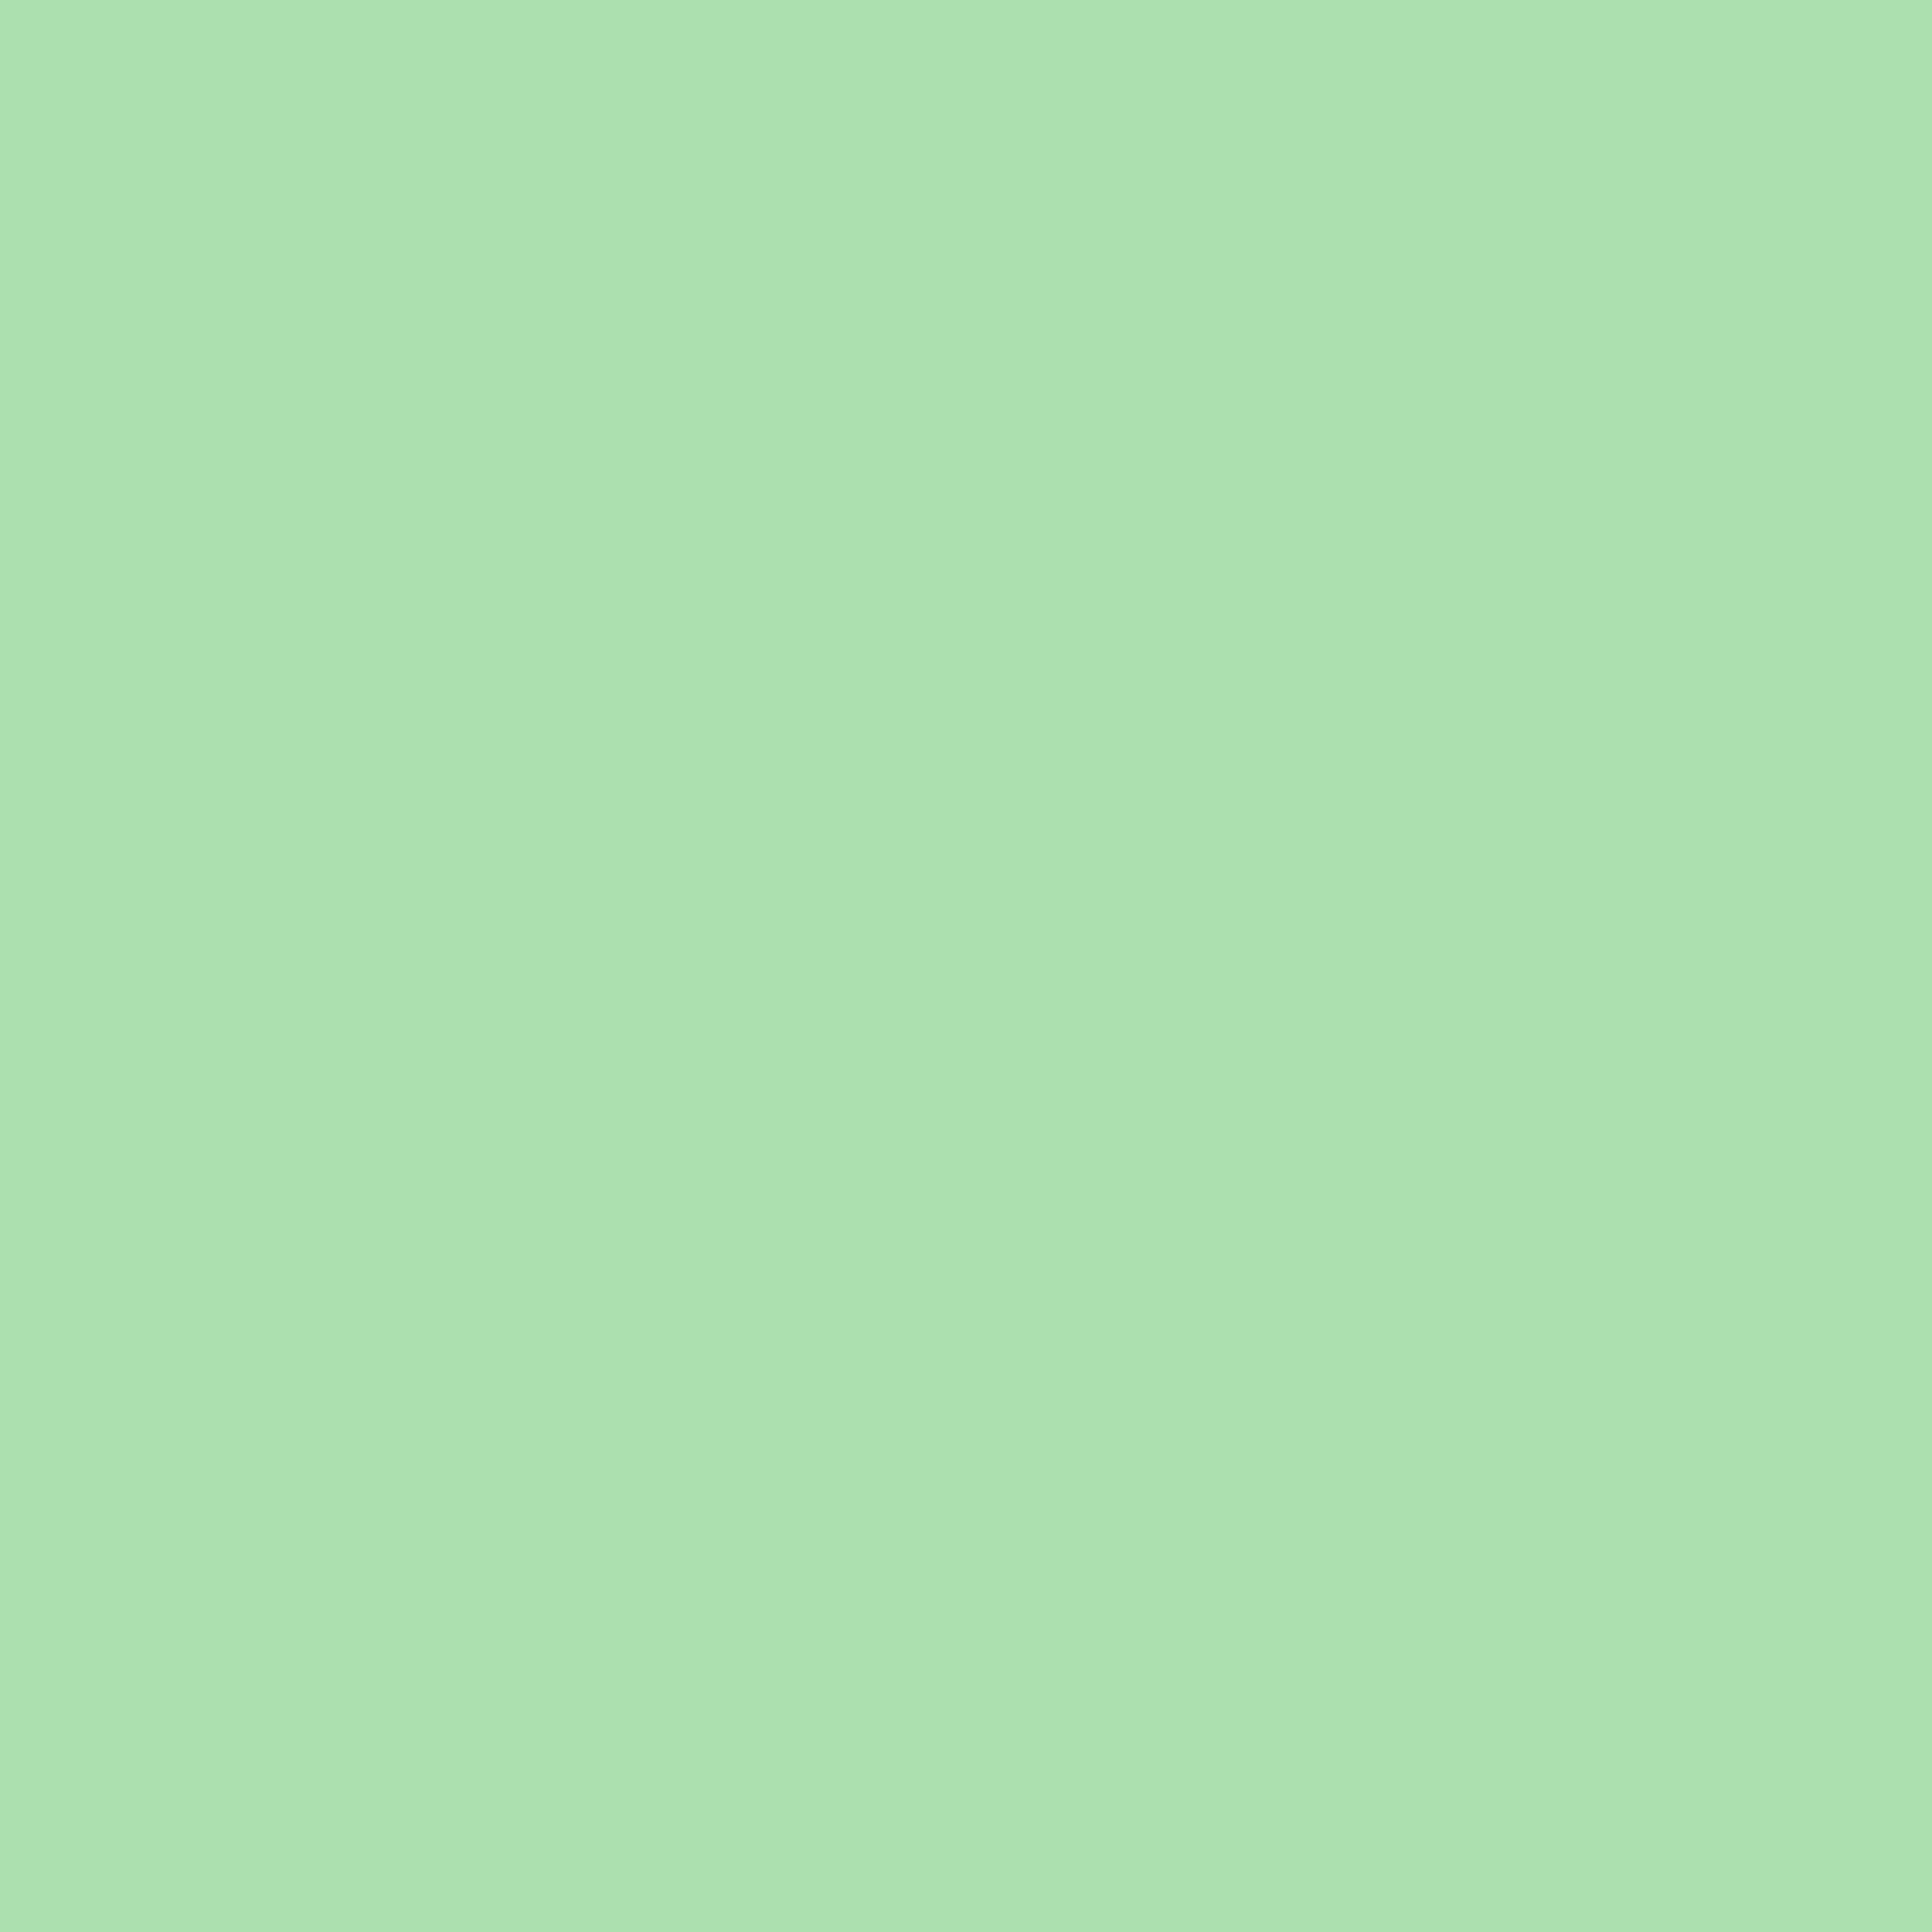 3600x3600 Celadon Solid Color Background